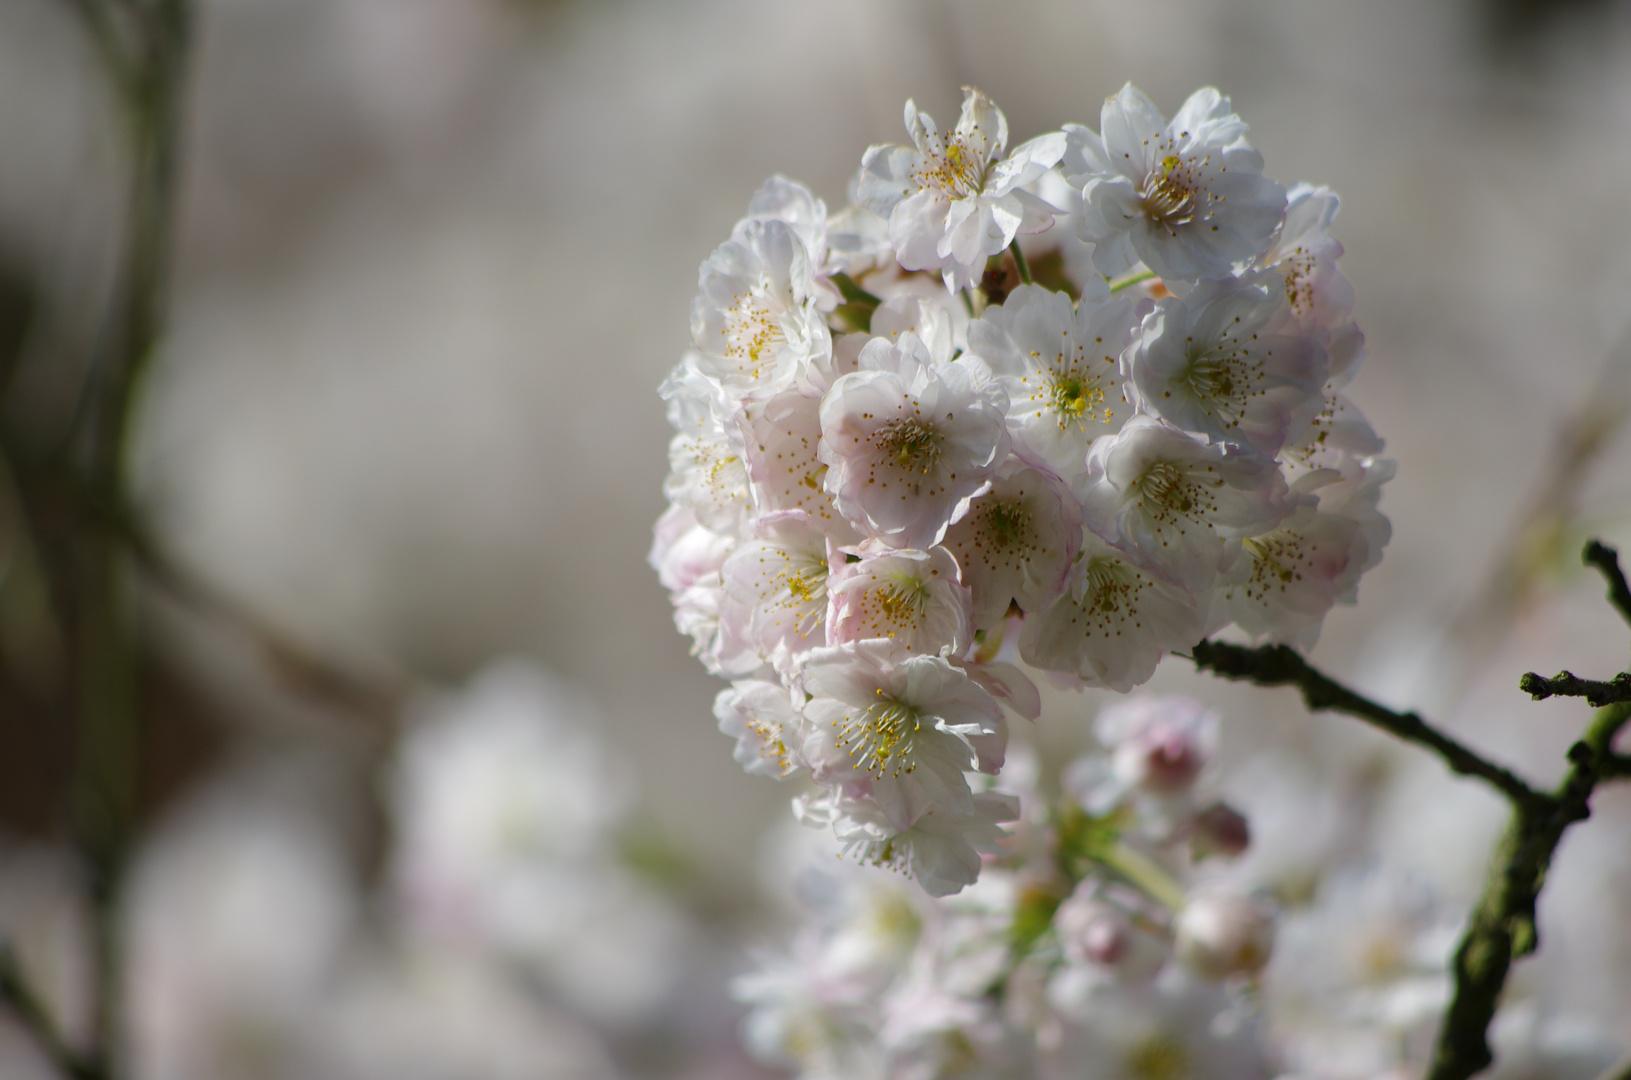 Himmlische Blüten